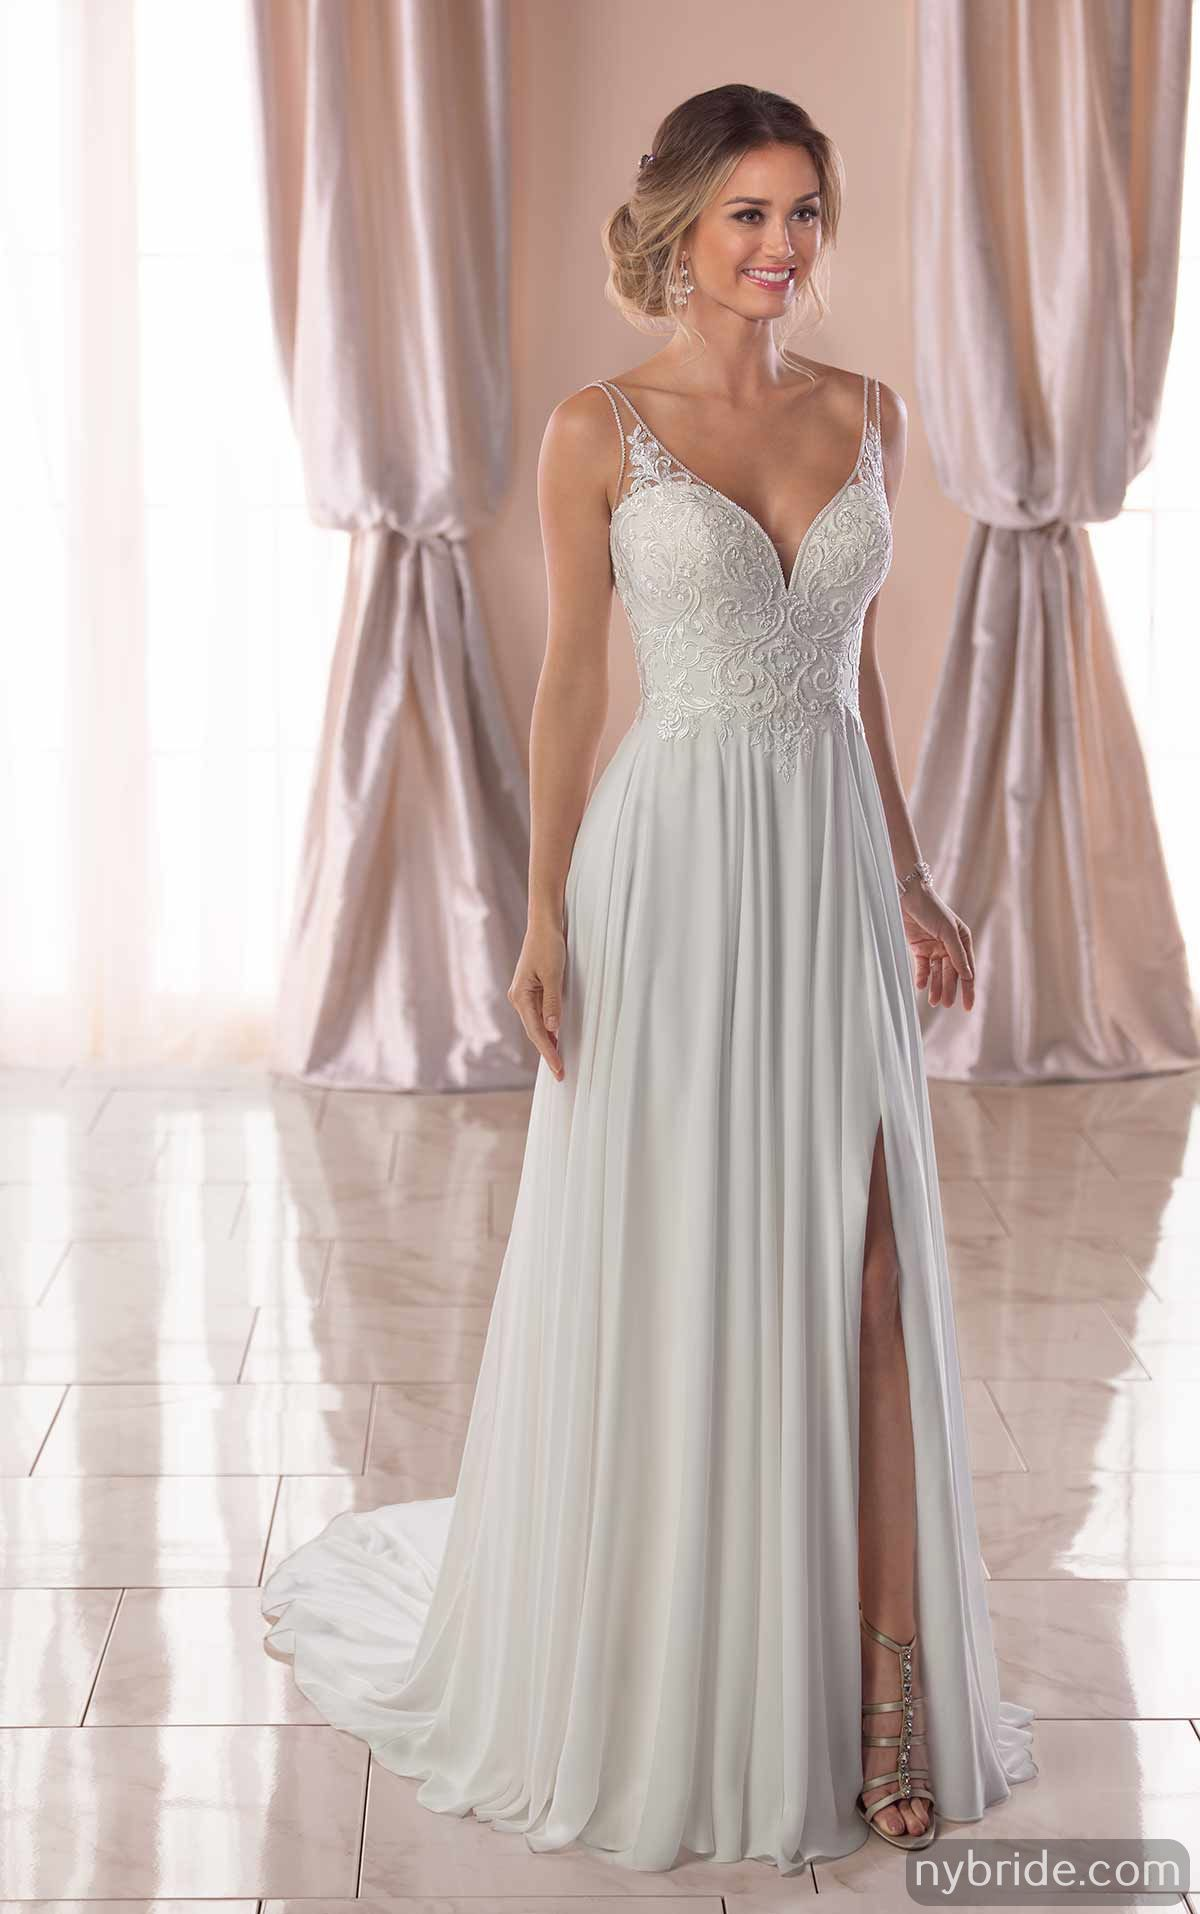 75216889ae1 Wedding Dress Stores Near Charlotte Nc - Gomes Weine AG